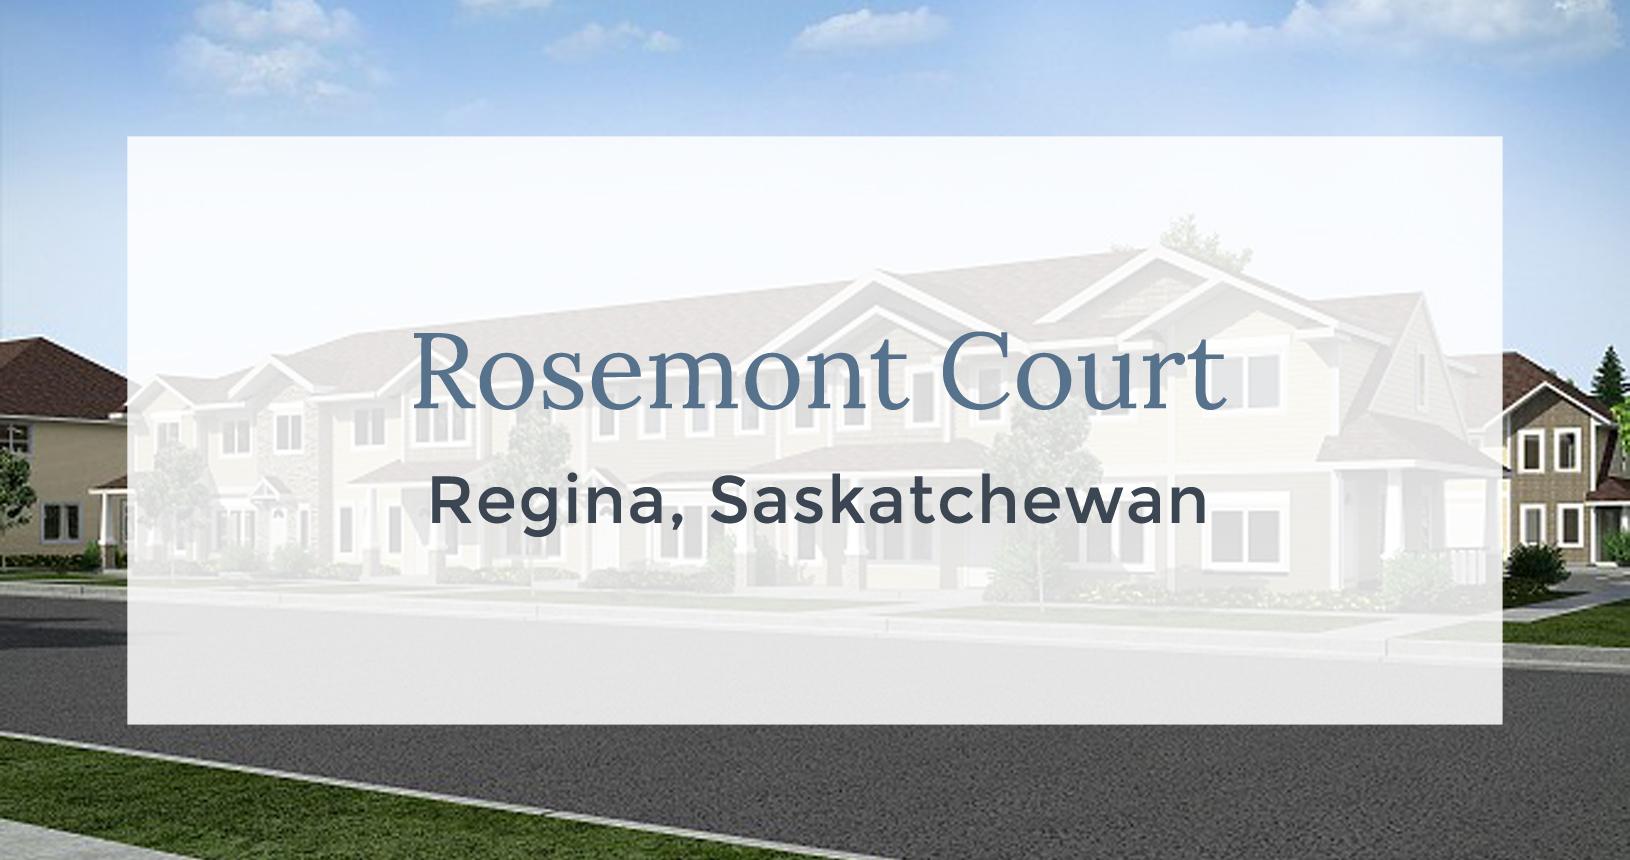 Rosemont Court: Regina, Saskatchewan